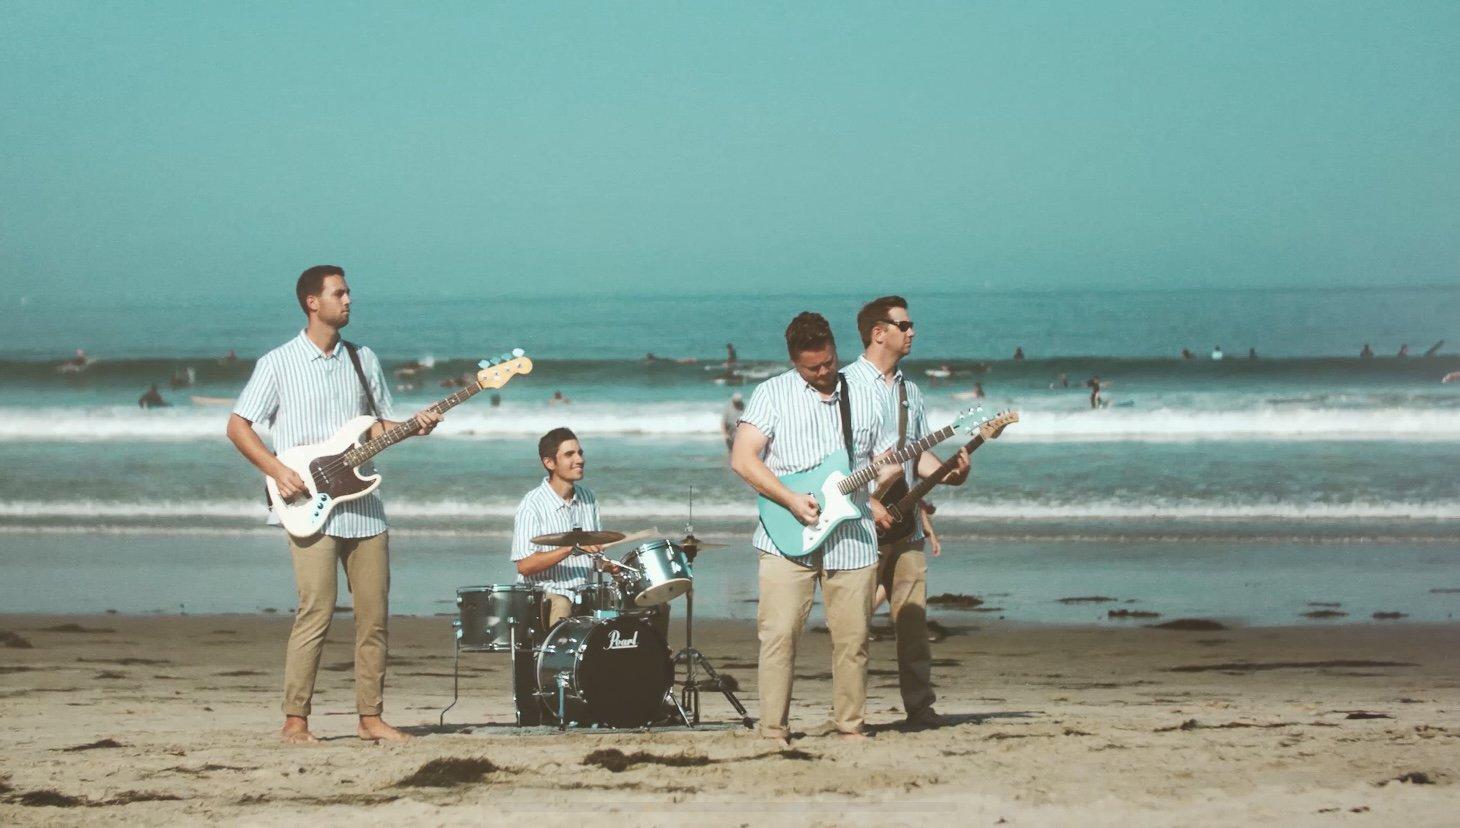 Die Band Nite Tides am Strand